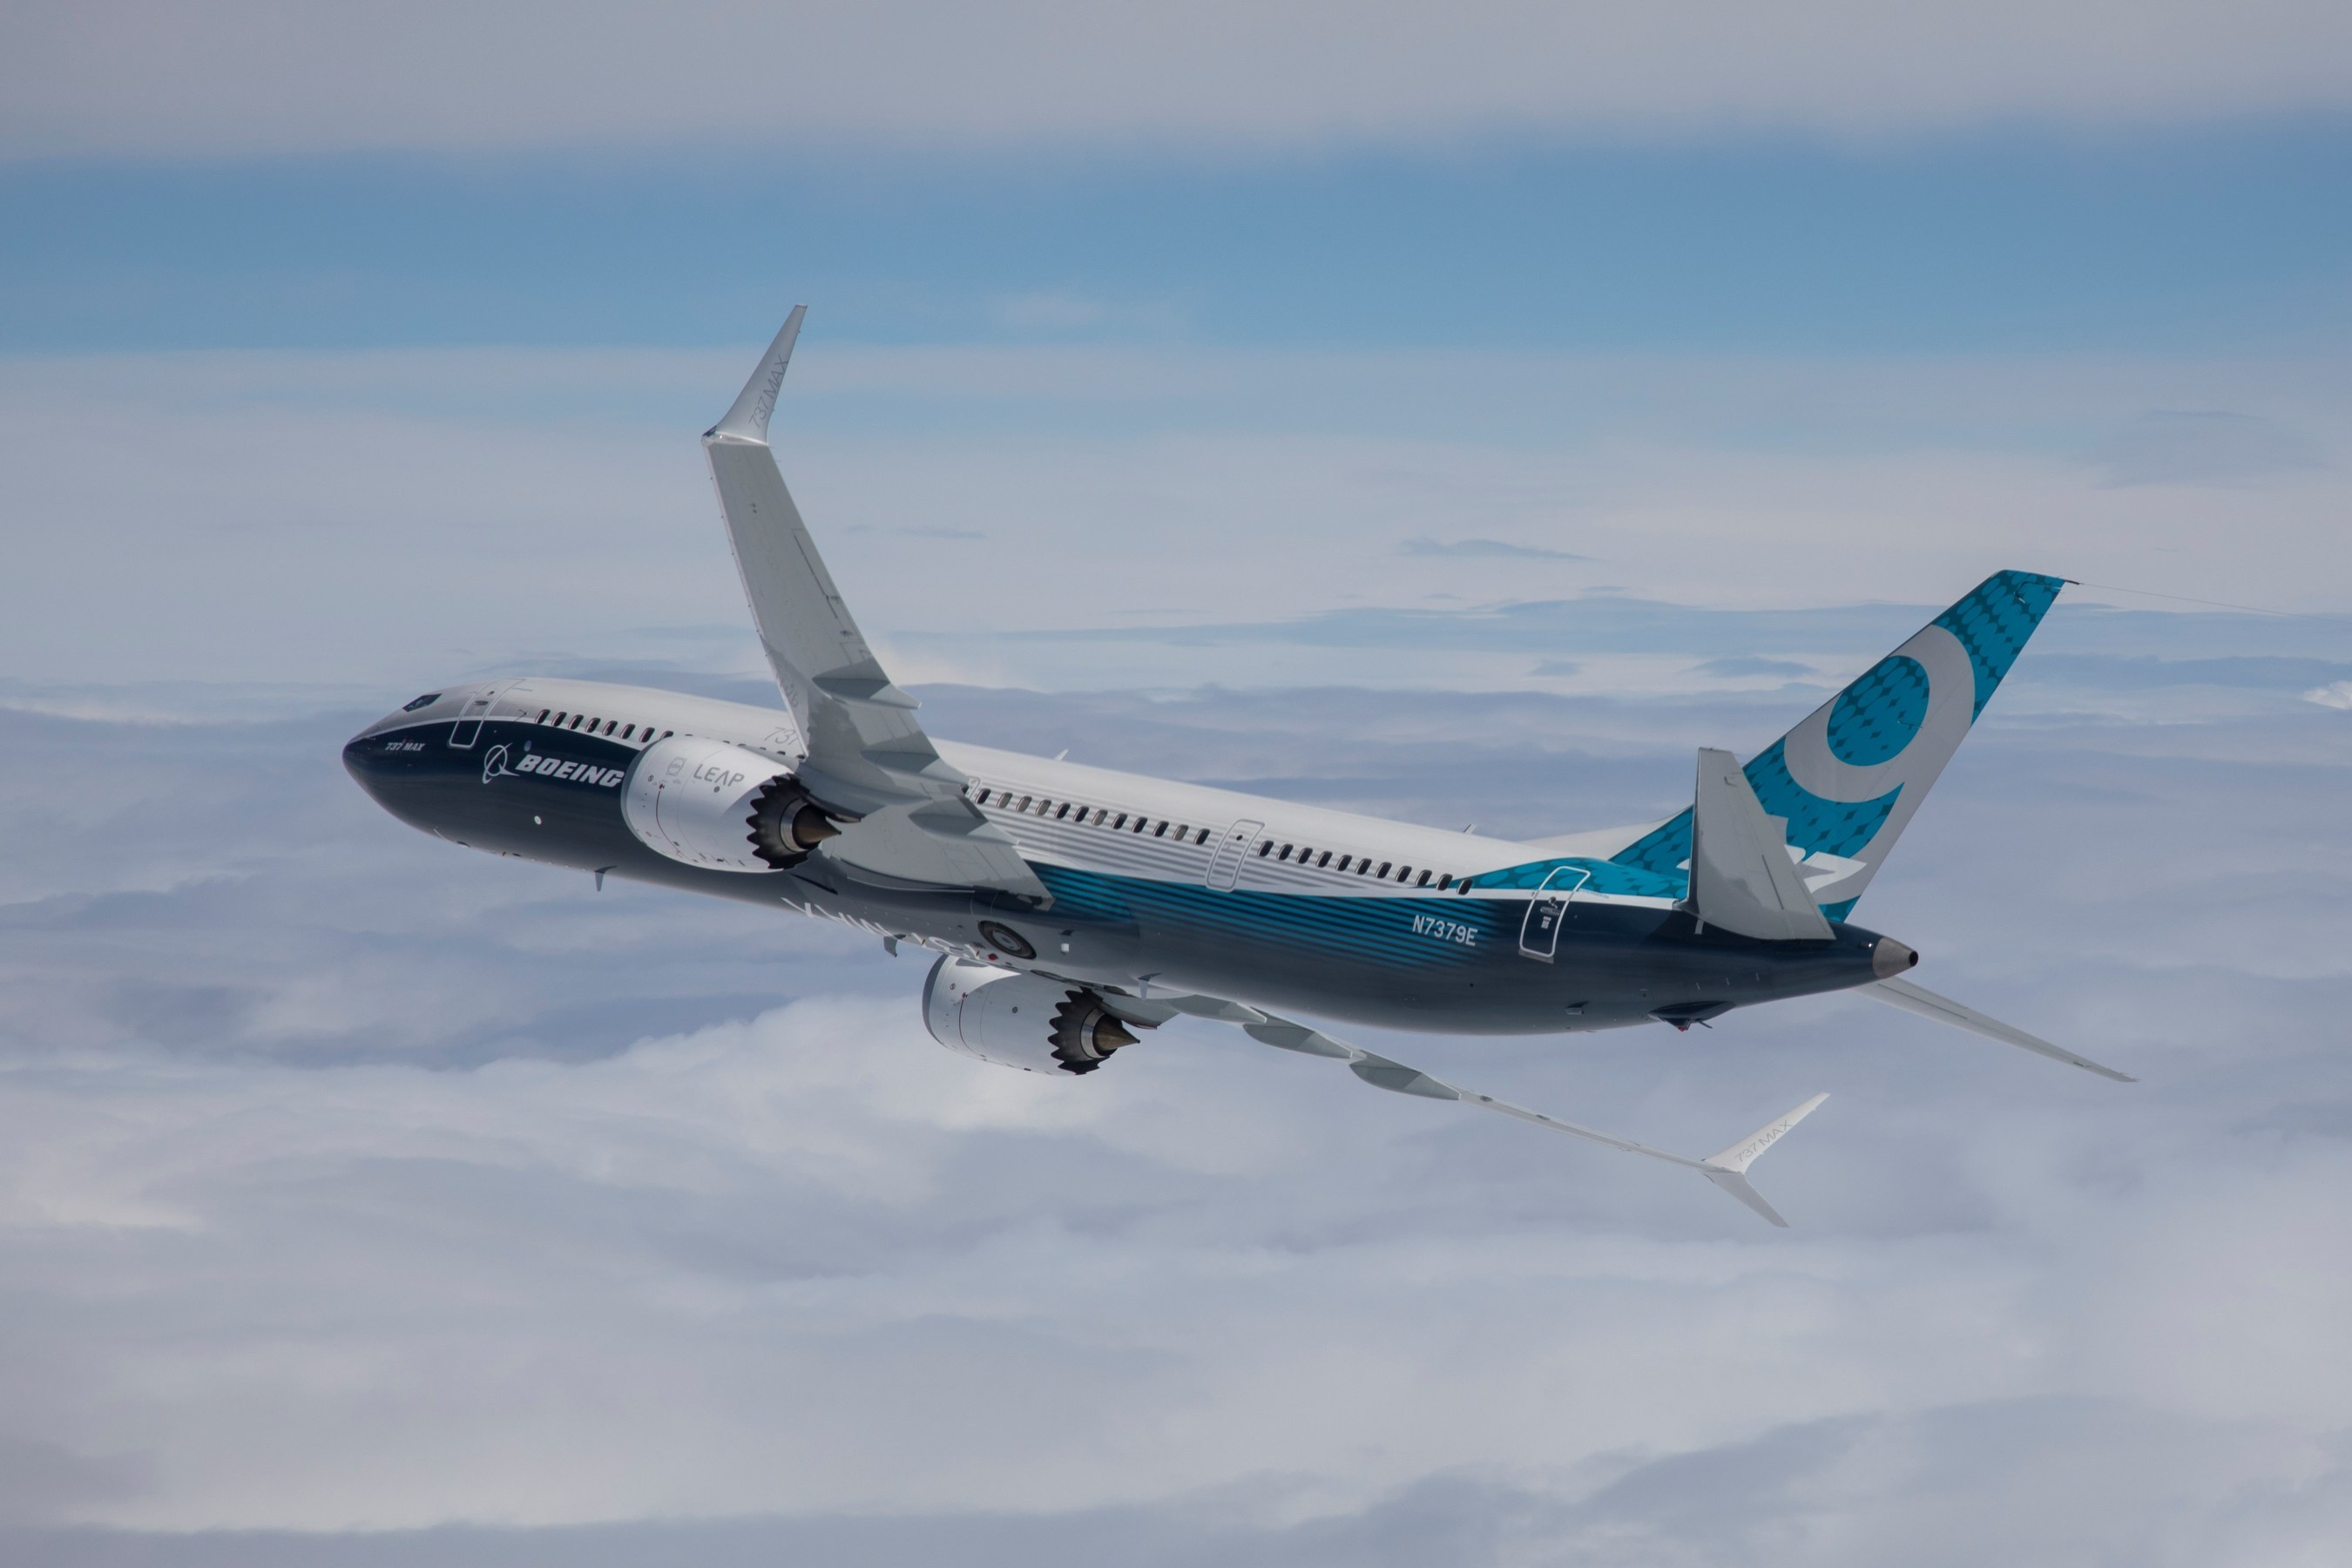 Jet engines get planes in the sky, but software keeps them safe